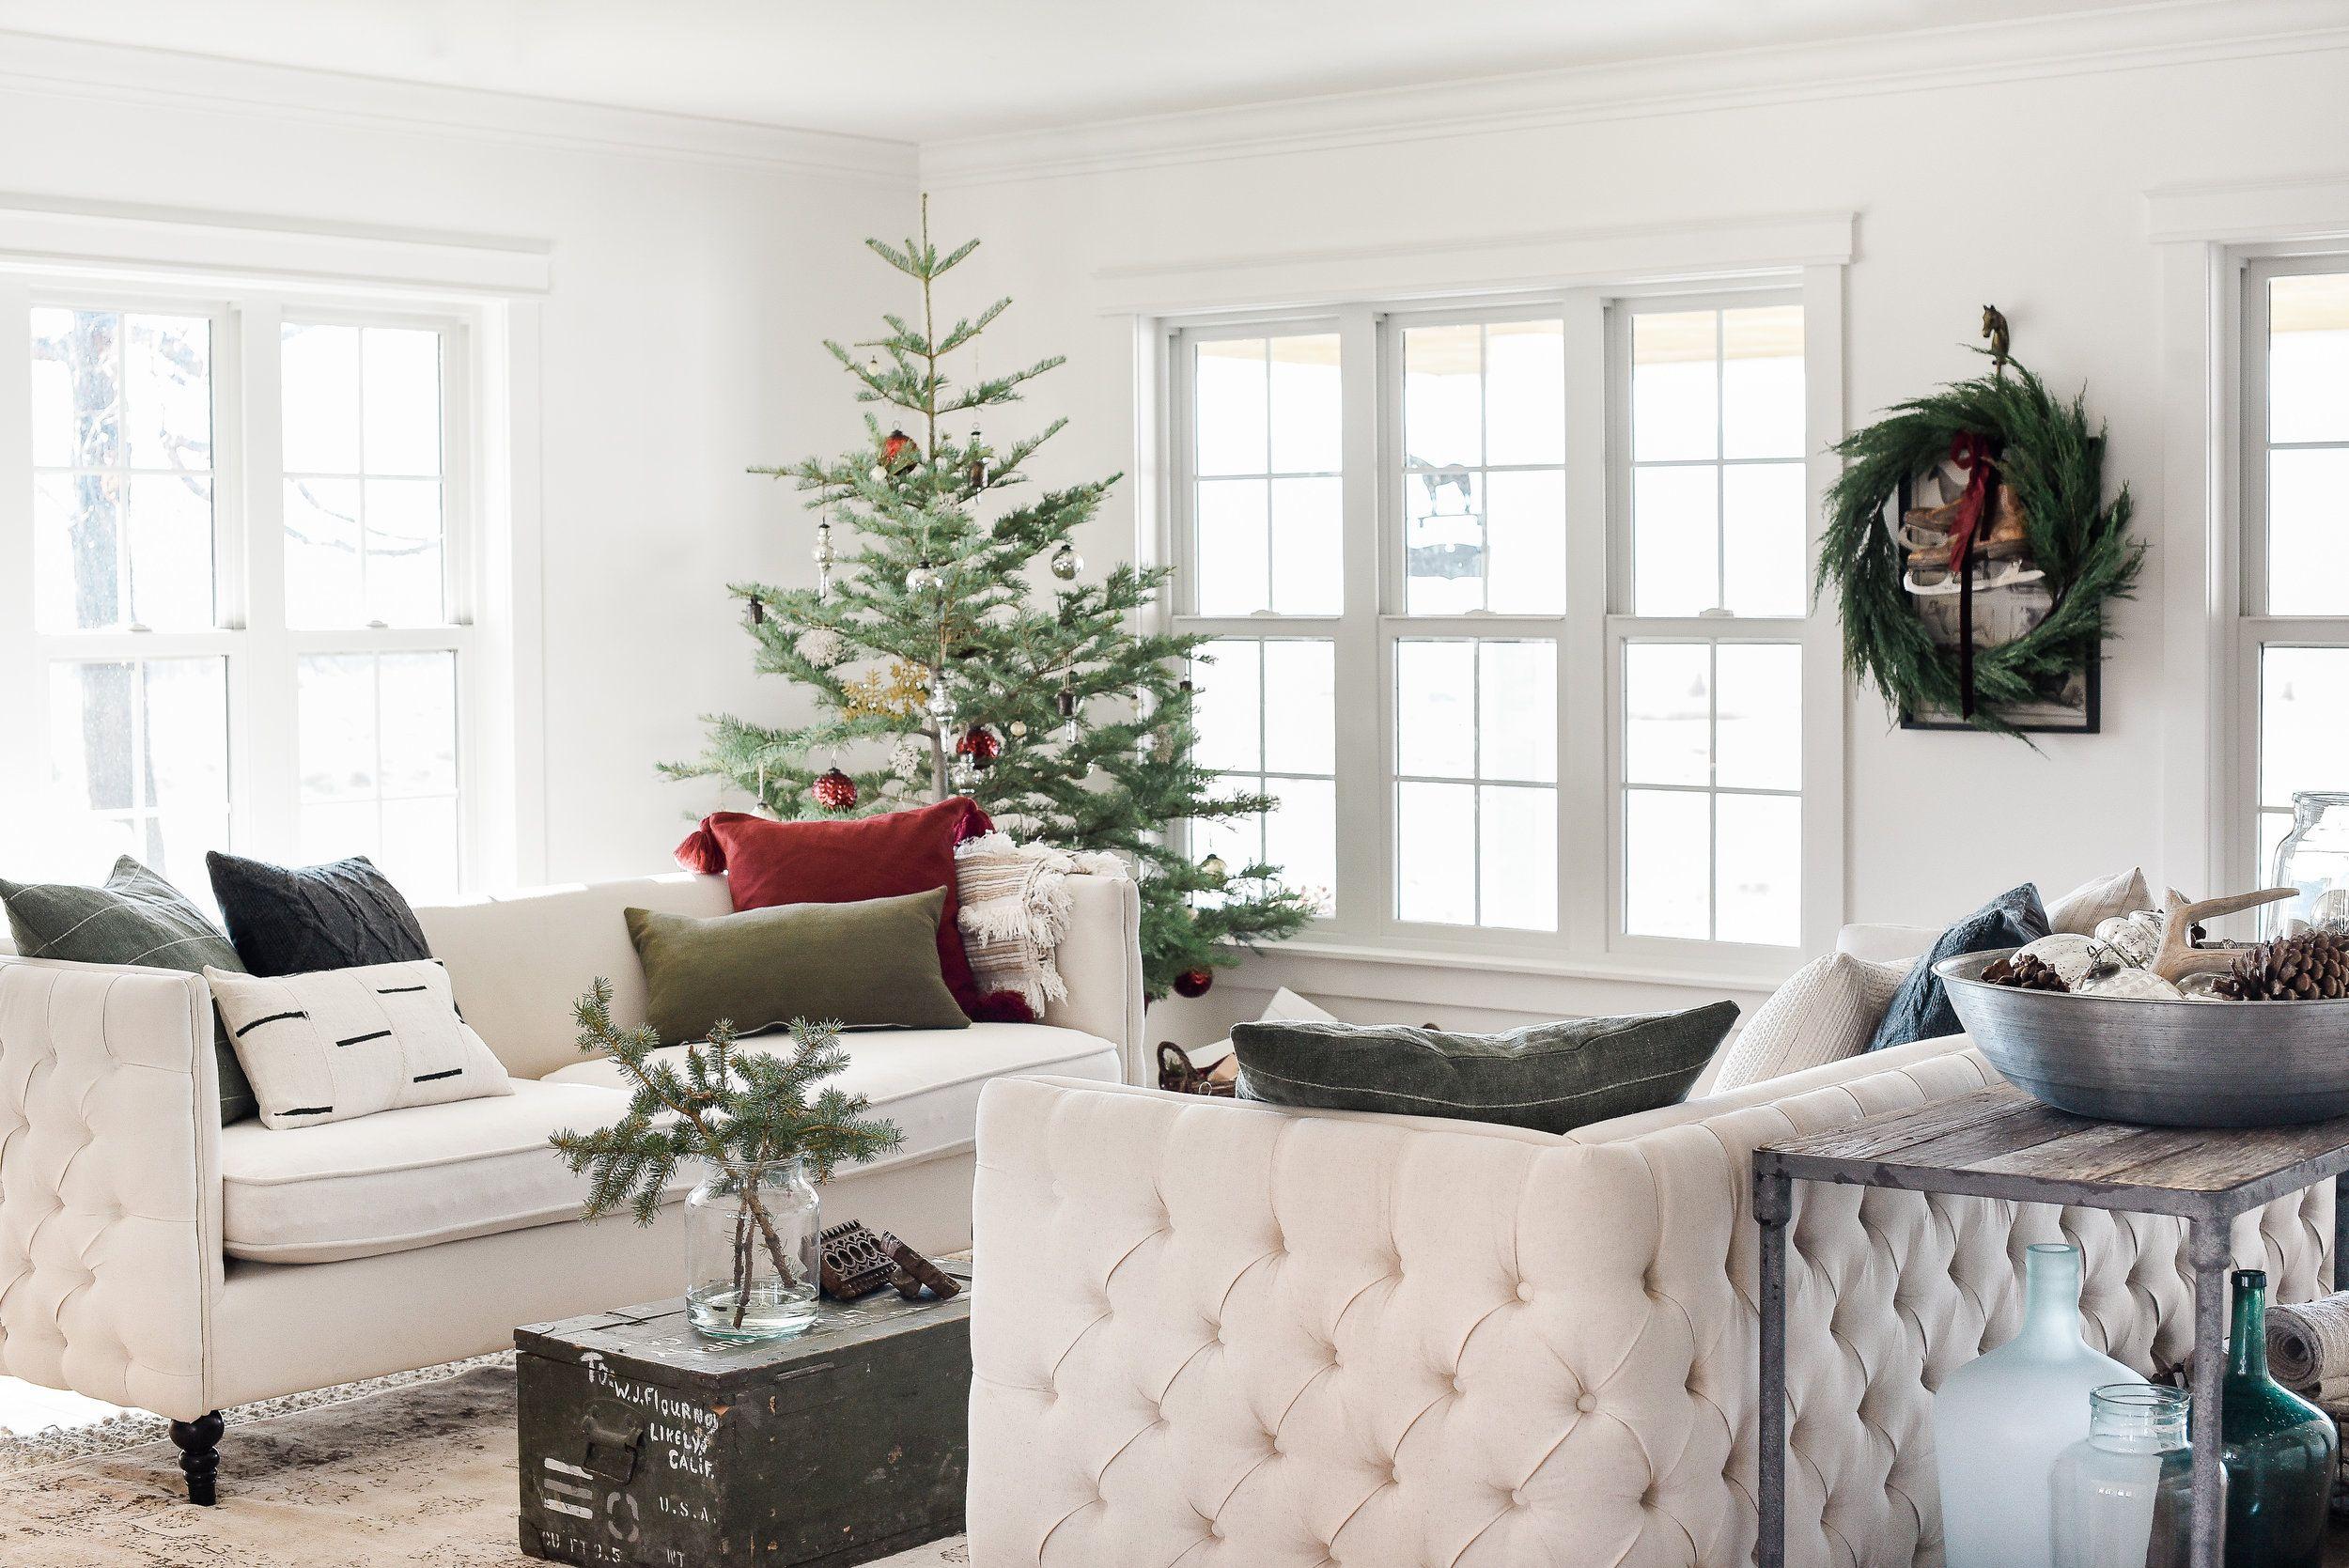 Farmhouse Christmas Decor: Living Room & Tree Ideas